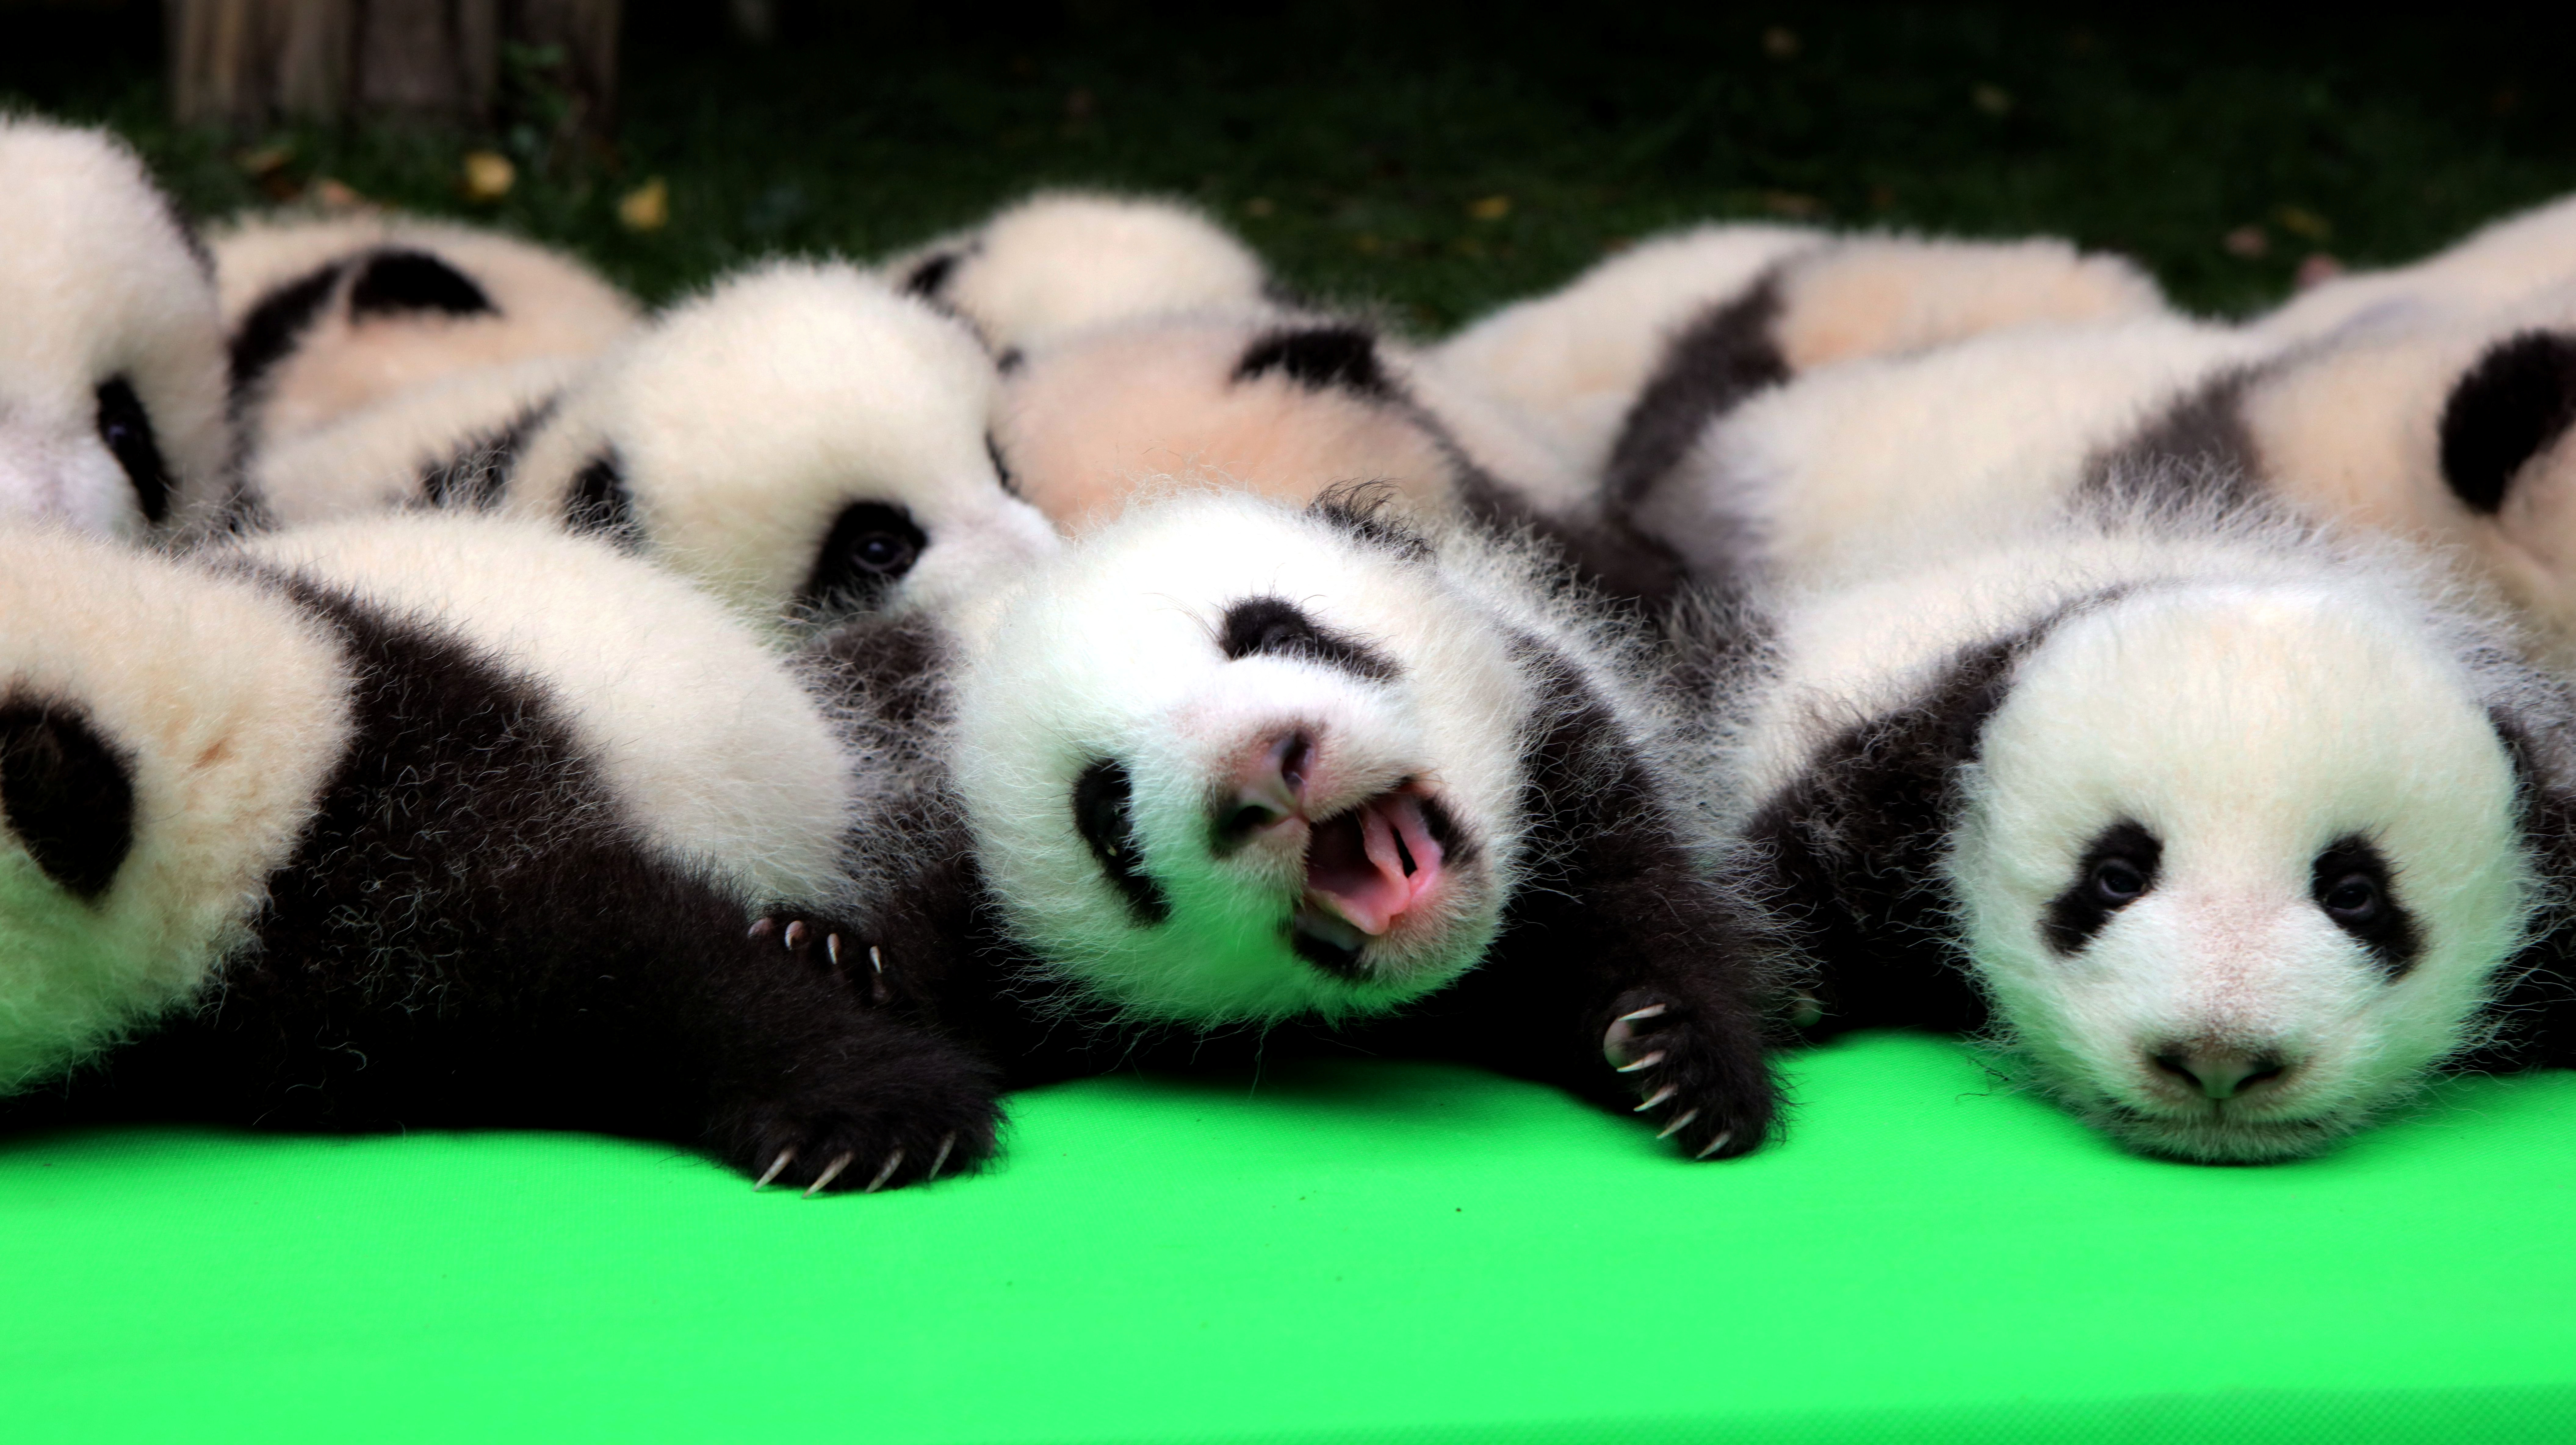 Maybe you had a bad 2016 but pandas didn't | Public Radio ...